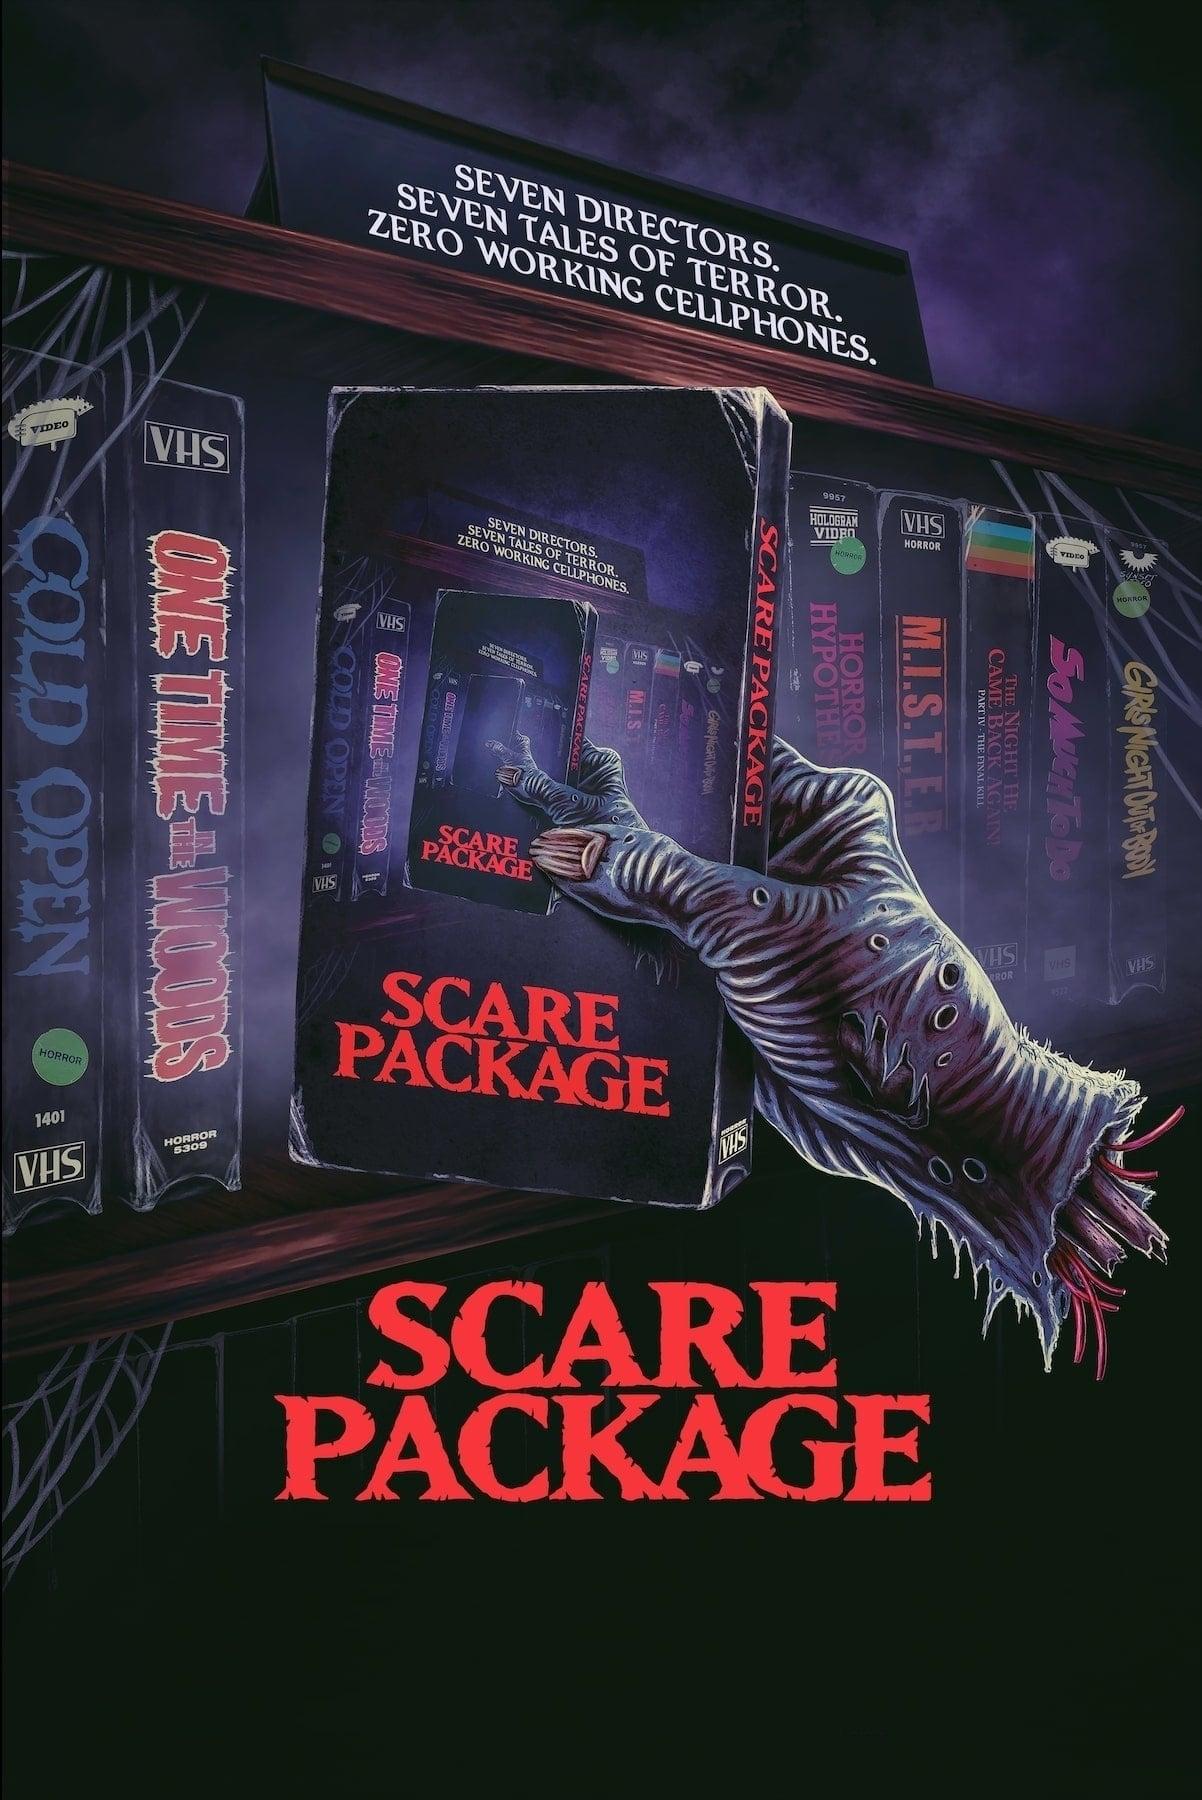 دانلود فیلم Scare Package 2019